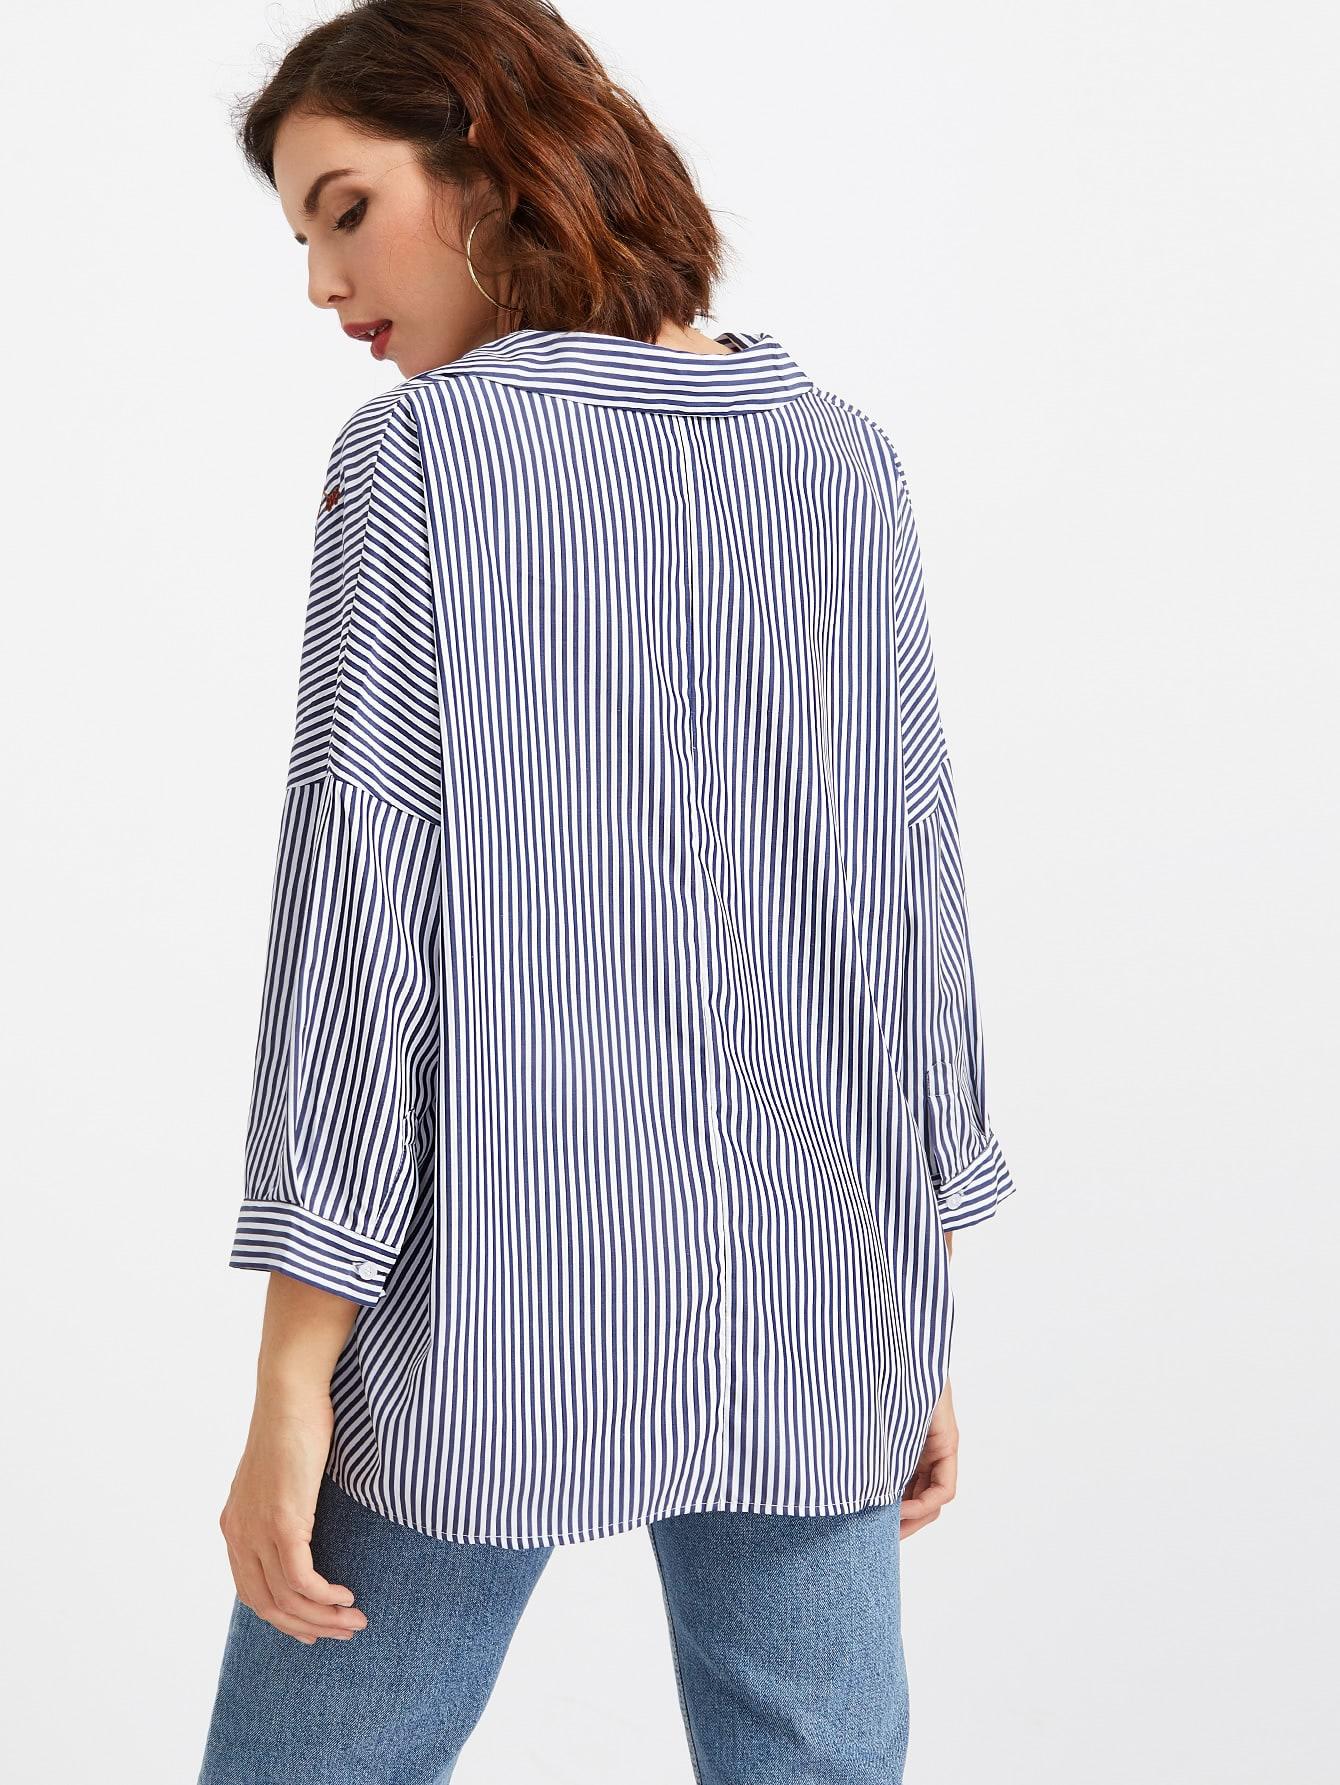 blouse170228201_2